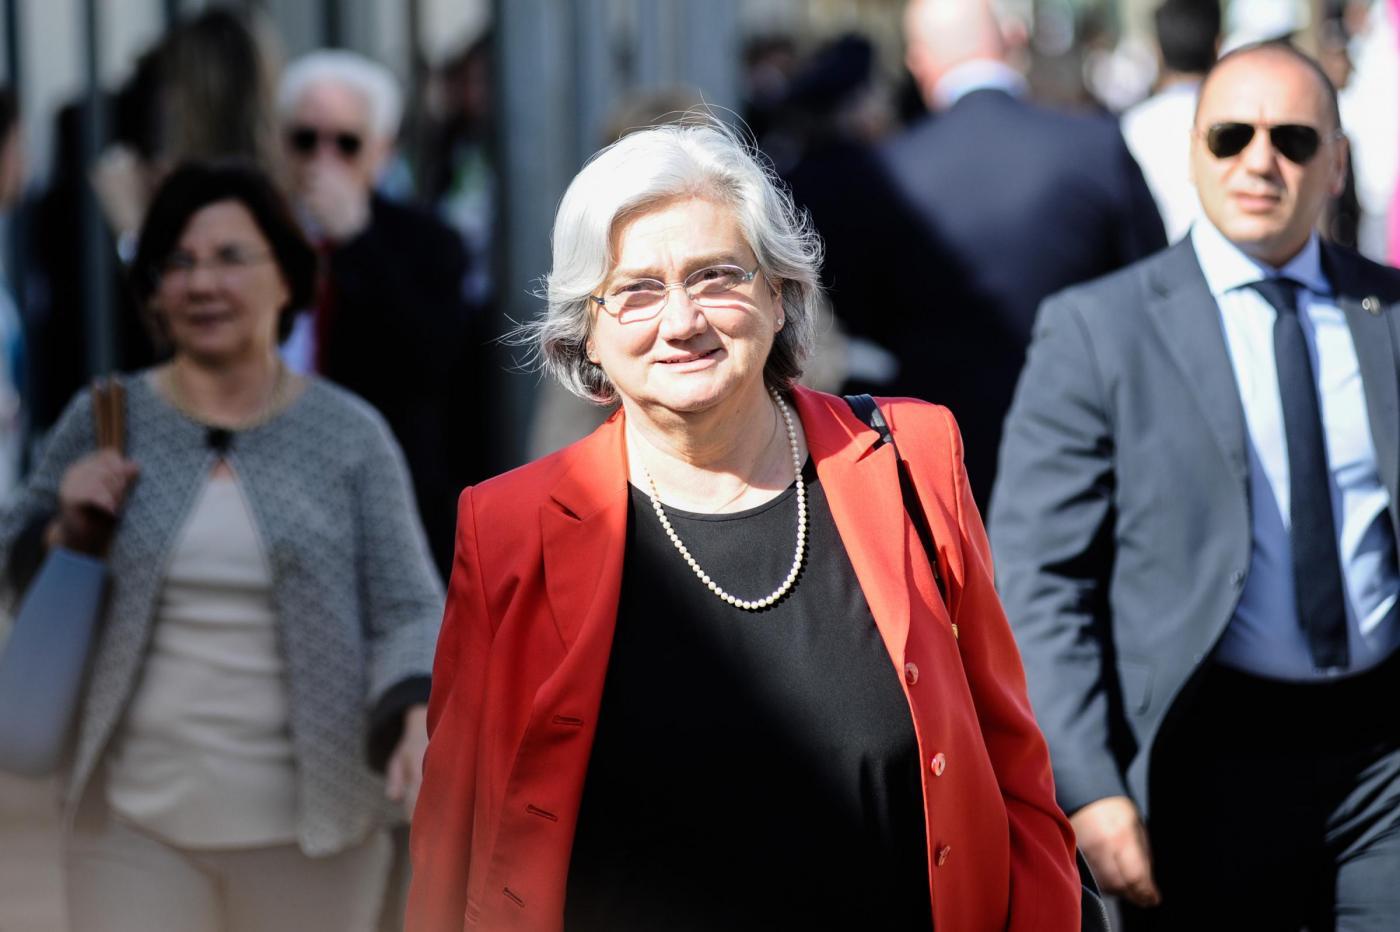 Elezioni comunali, Rosy Bindi: '14 candidati impresentabili'